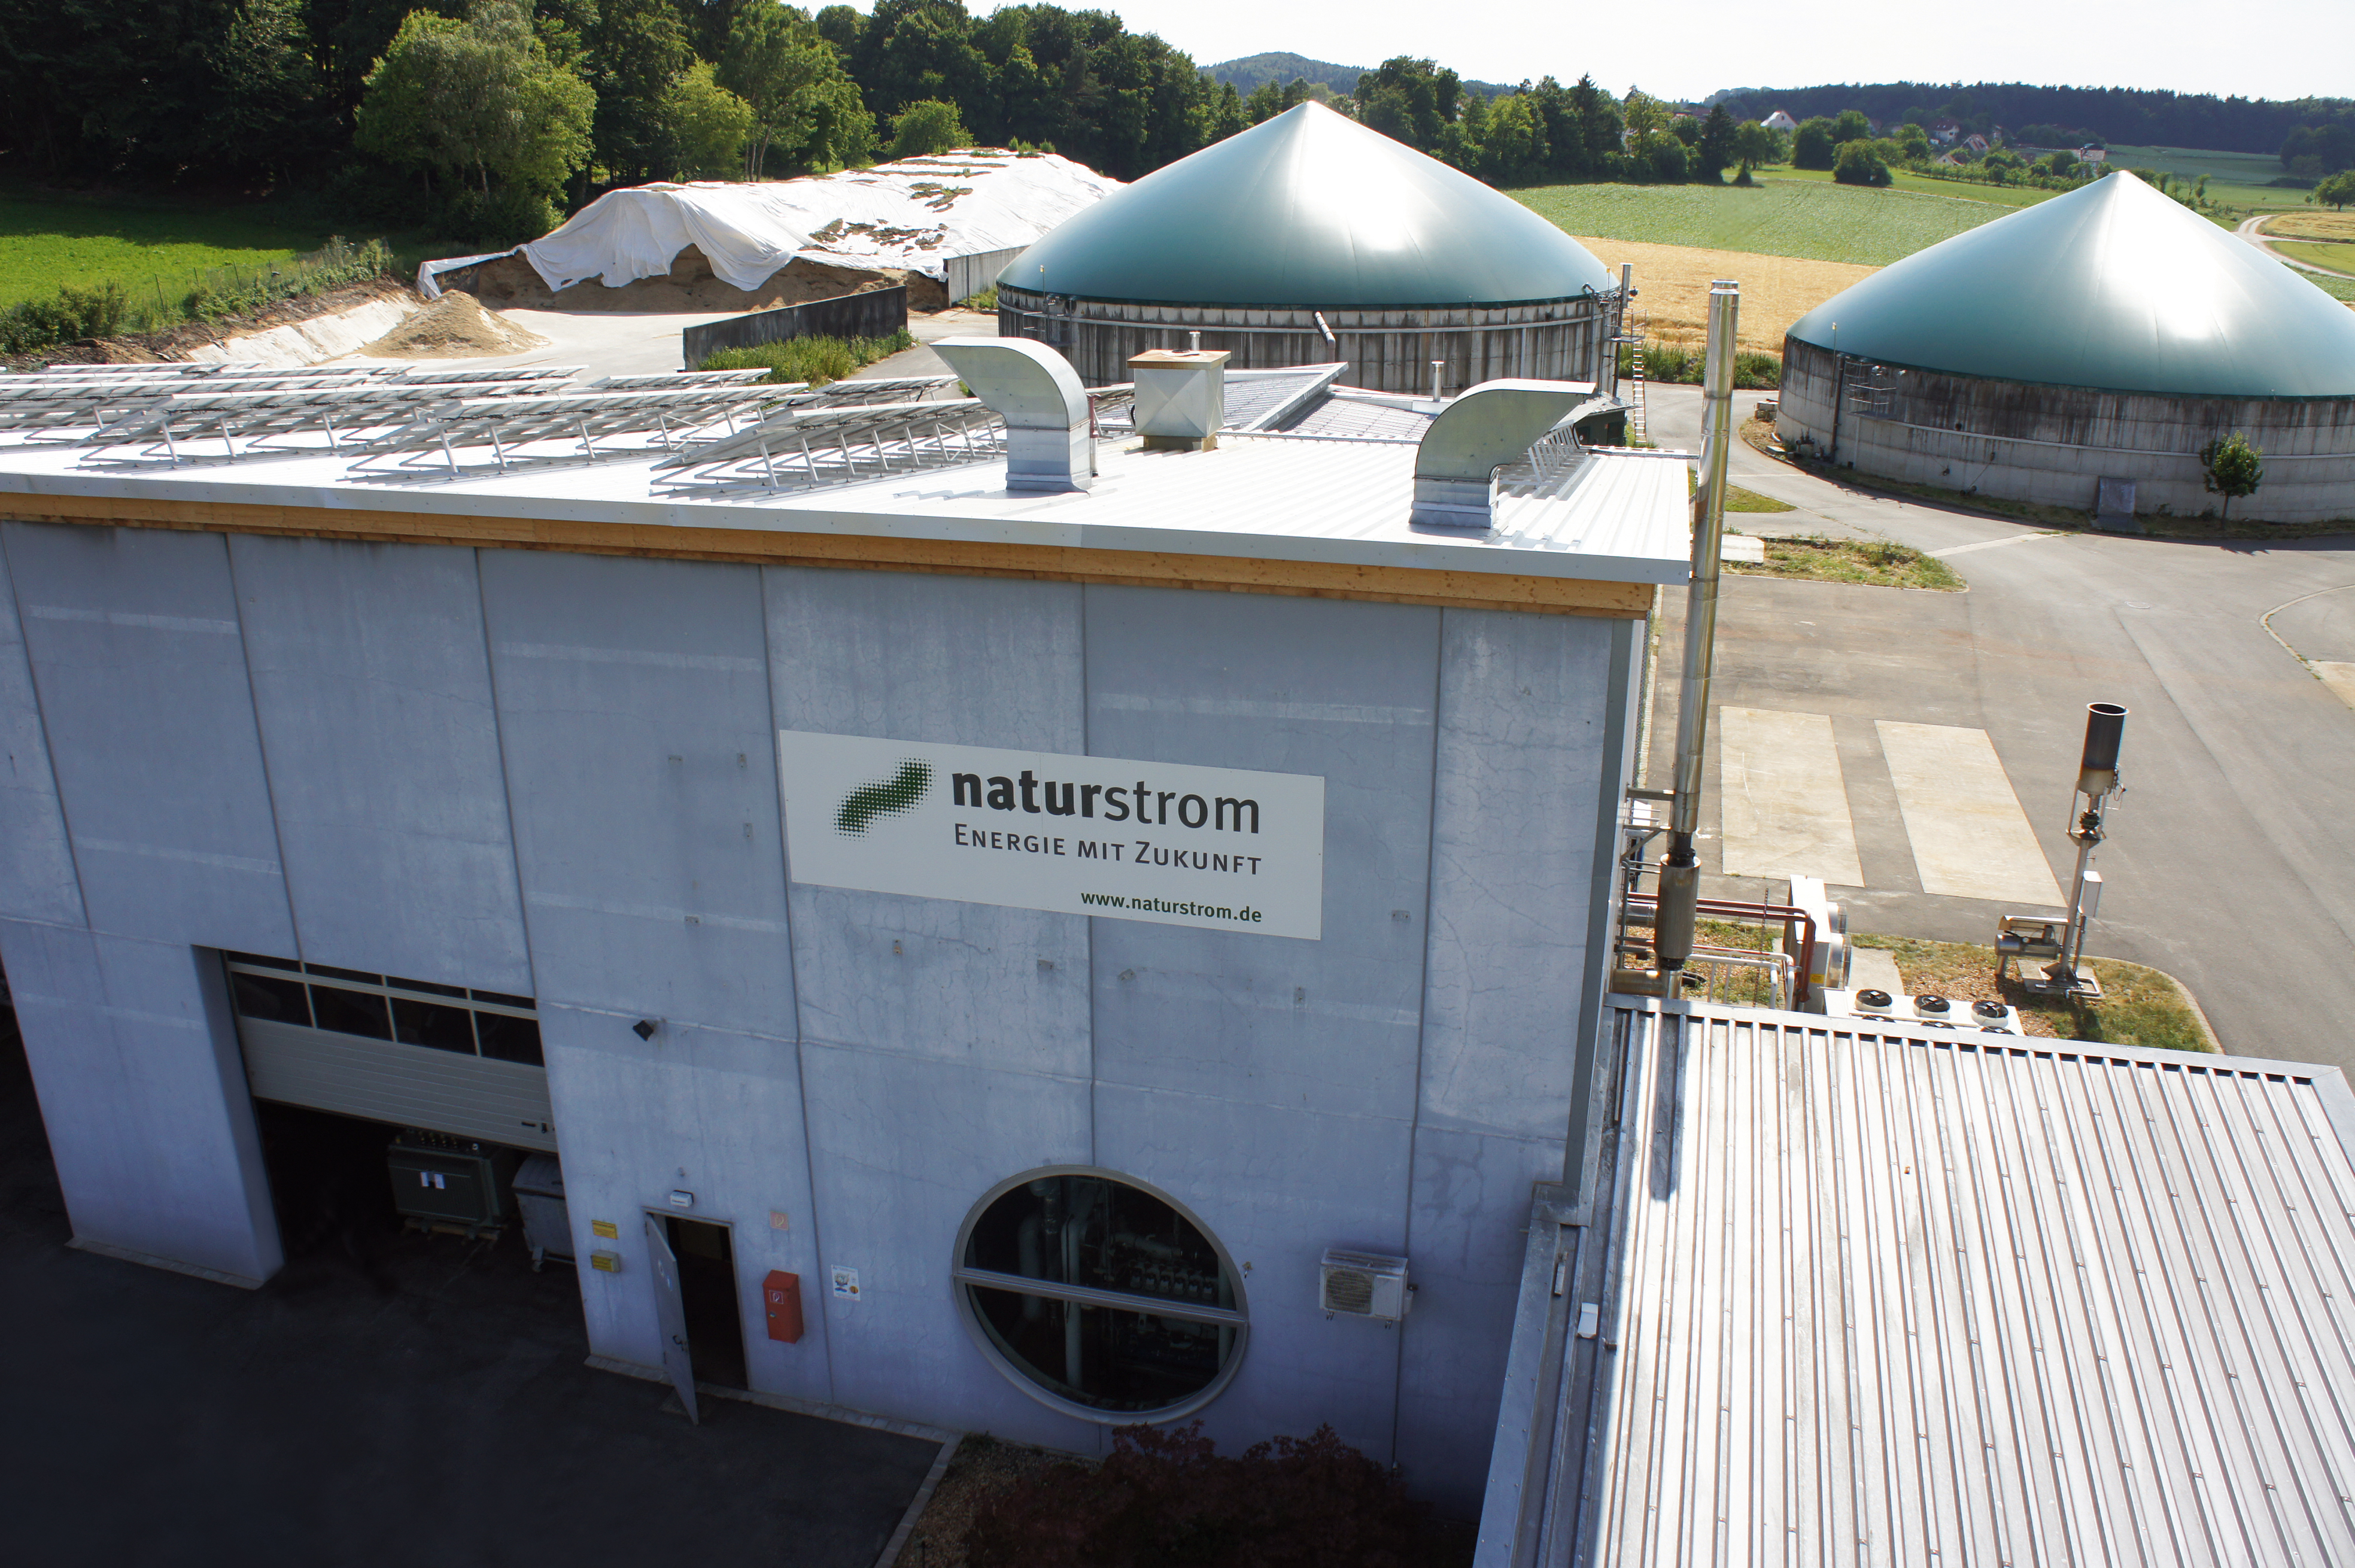 central de Bio masa construida por Naturstrom